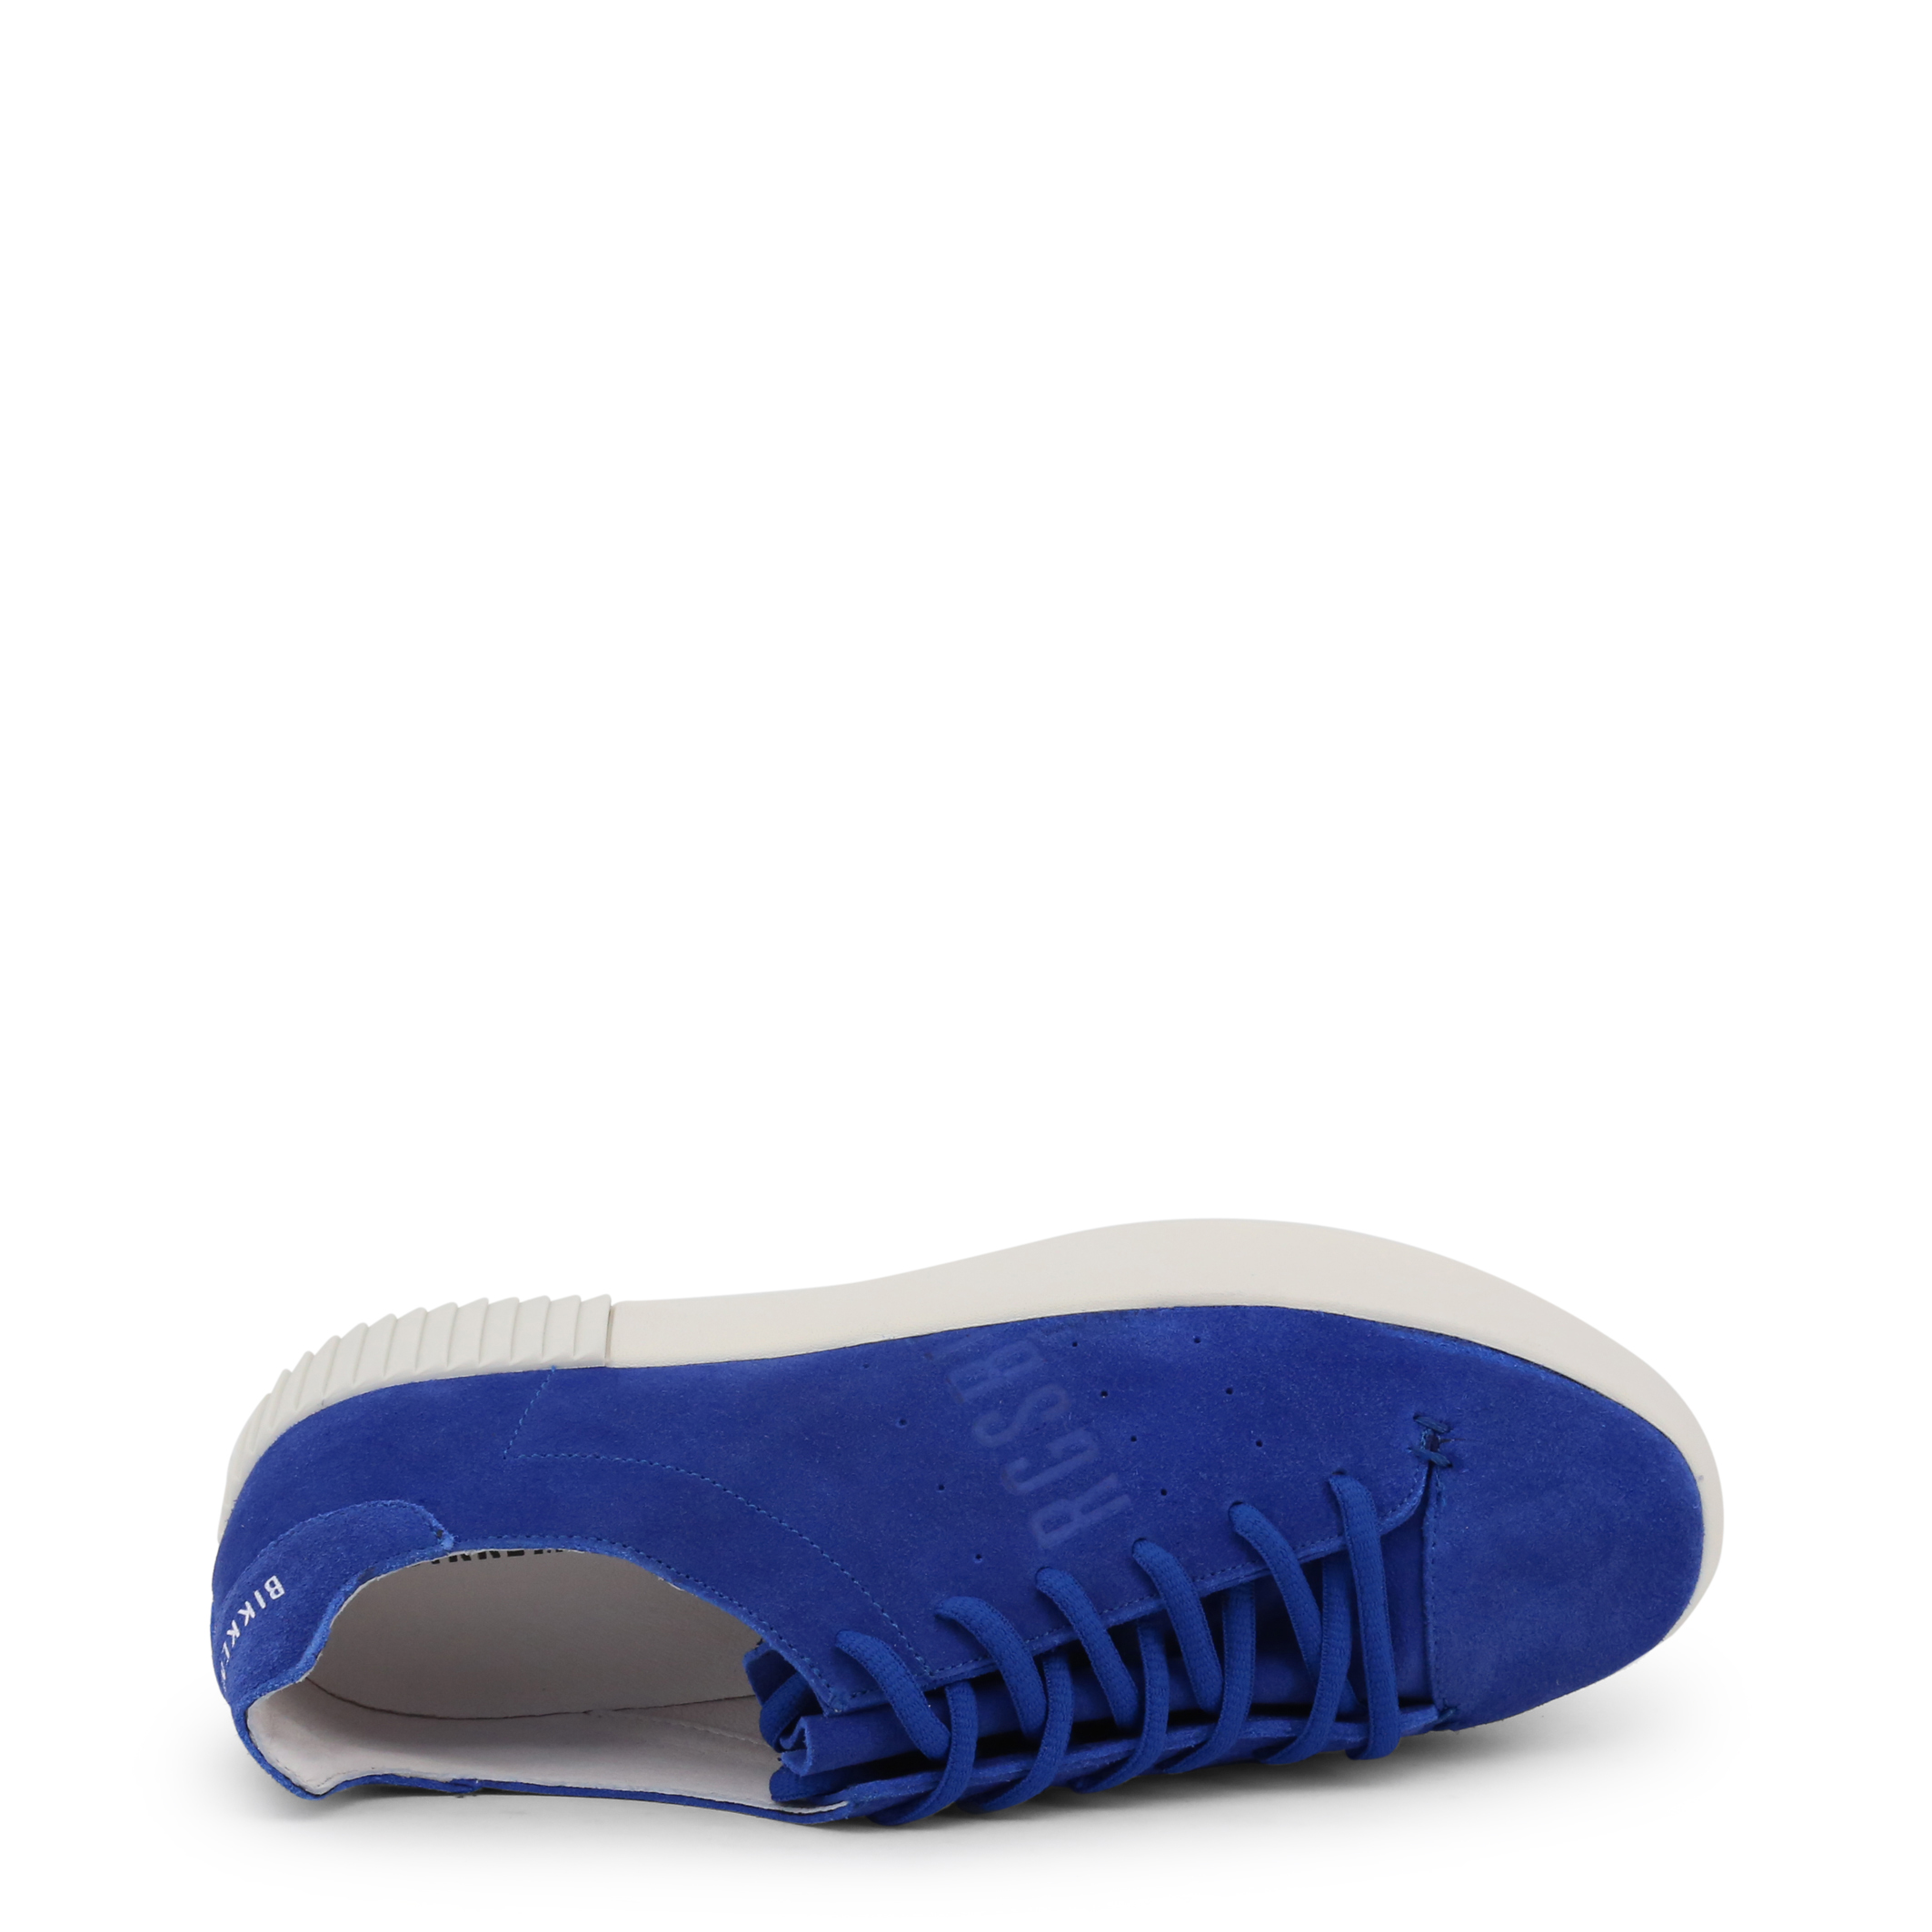 Sneakers-Bikkembergs-COSMOS-2100-SUEDE-Uomo-Blu-98816 miniatura 3